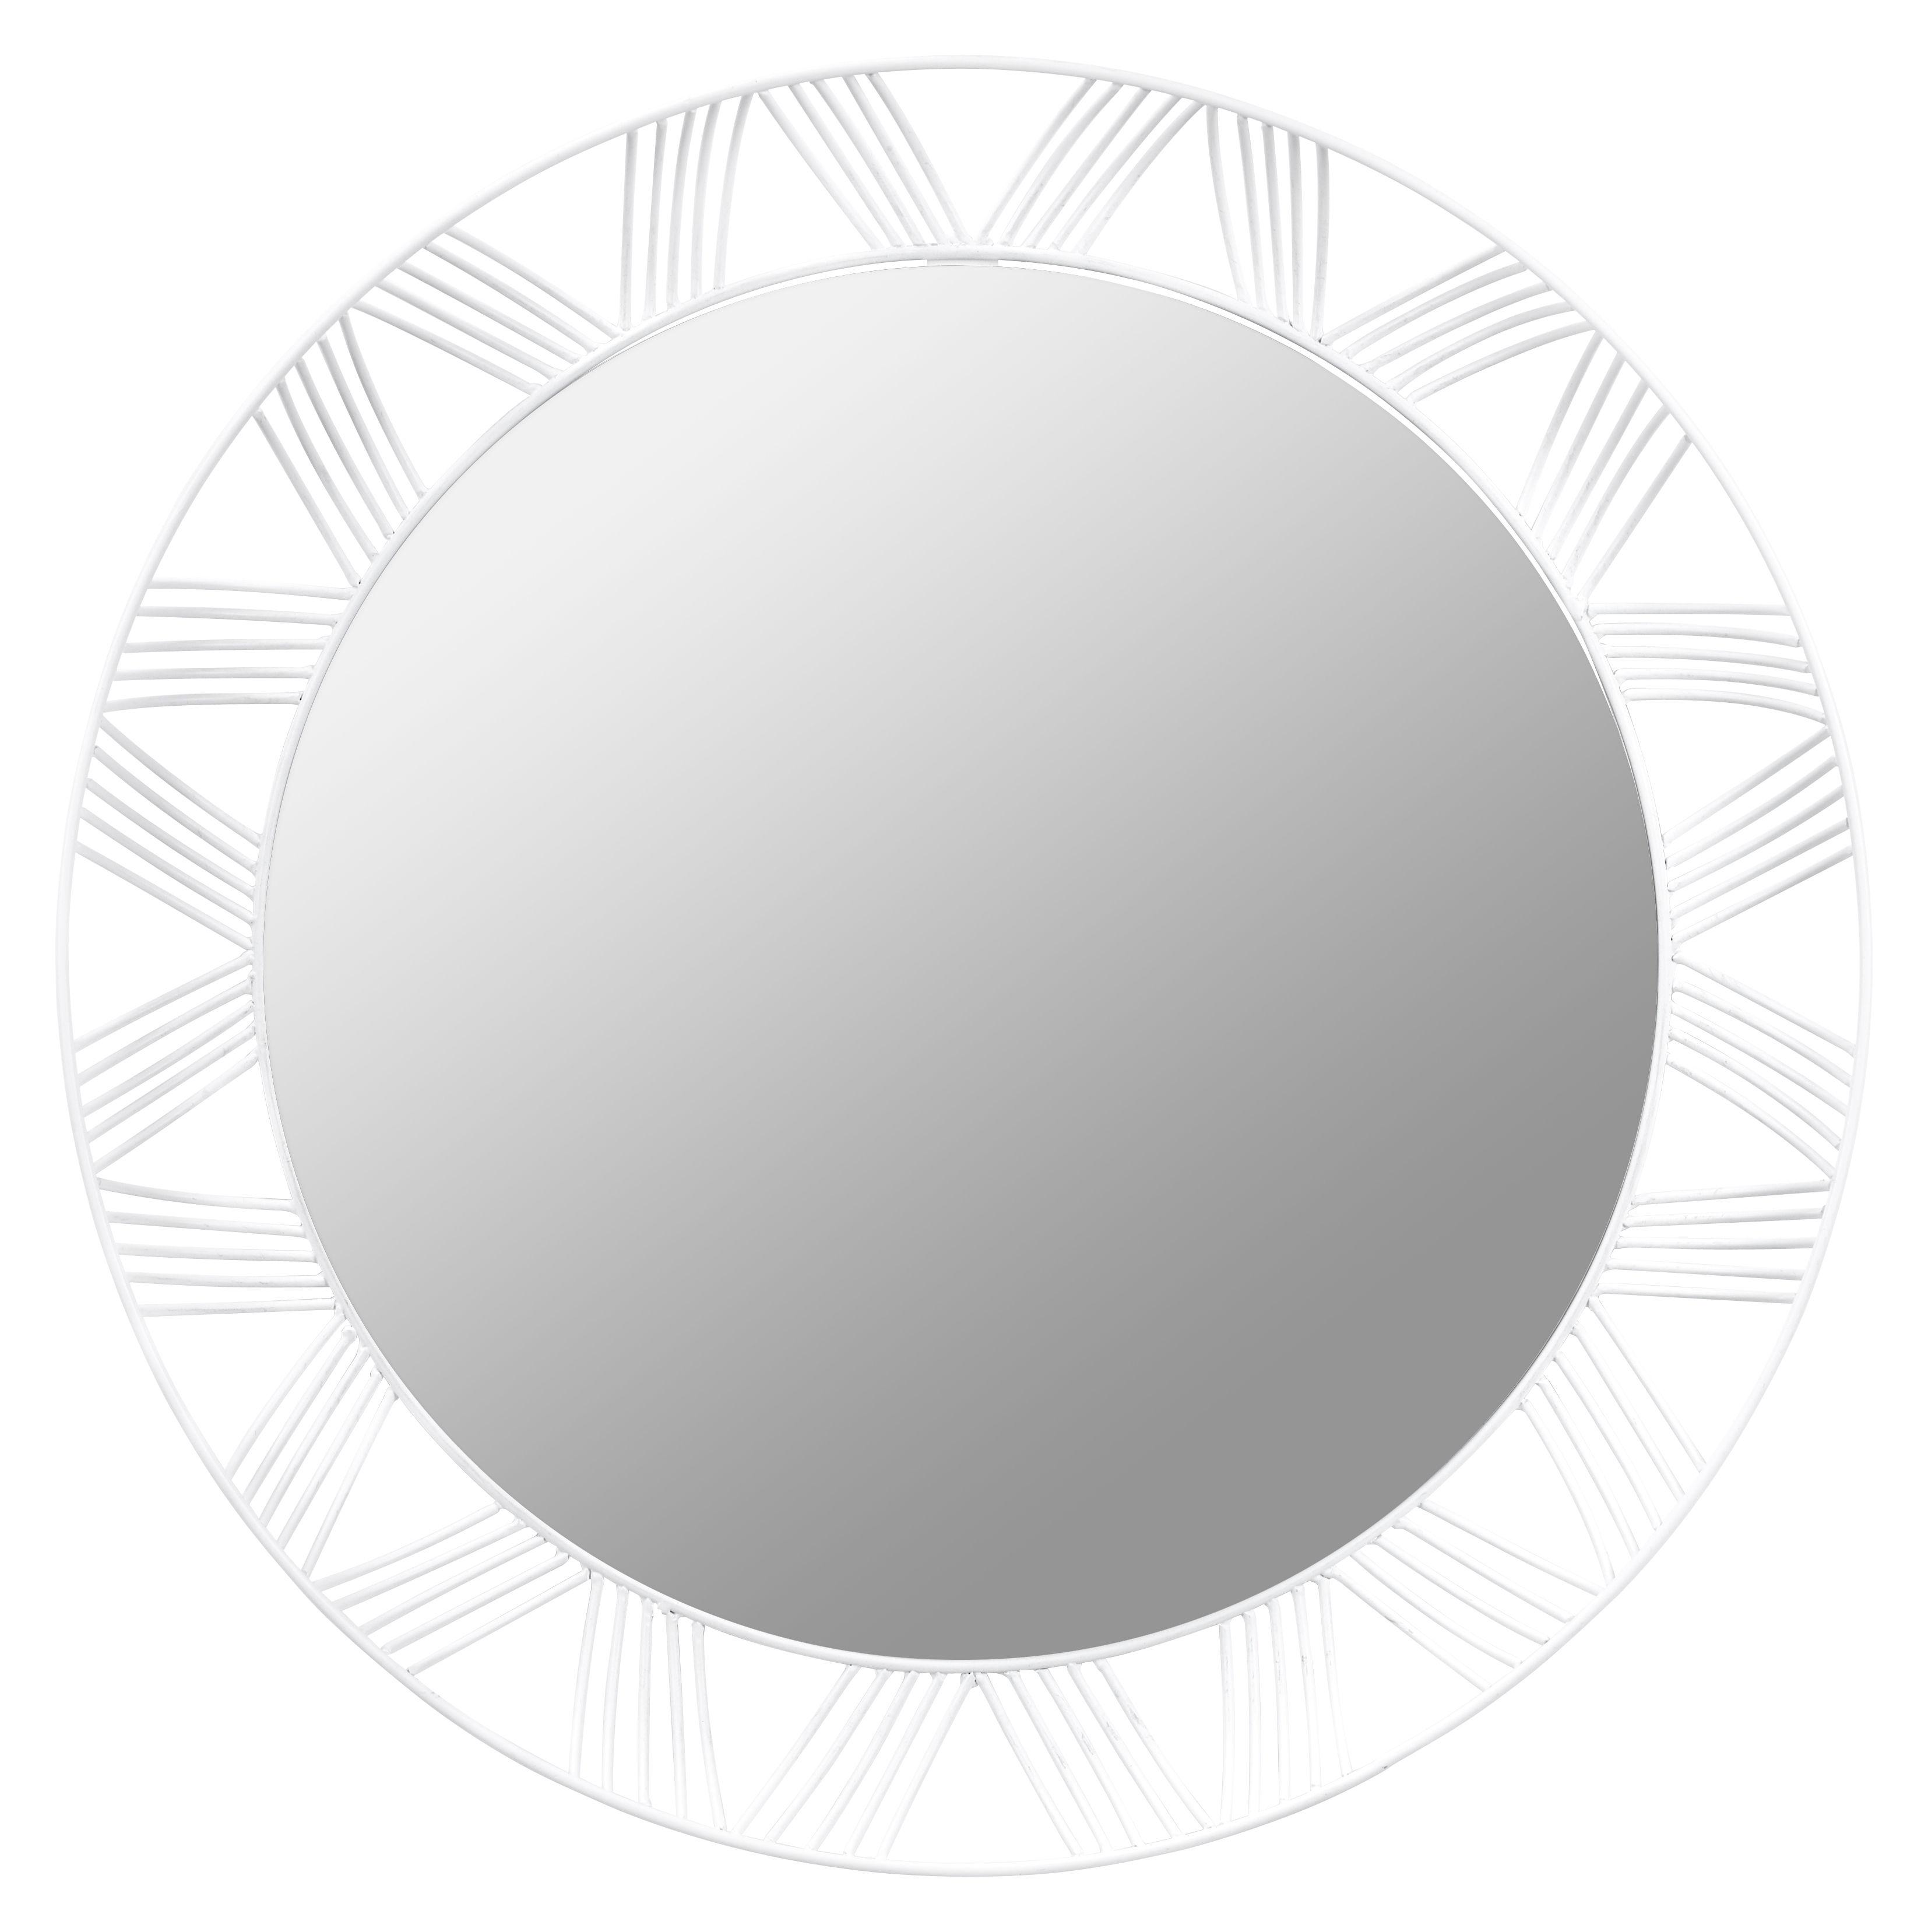 Déco - Miroirs - Miroir mural Stilk / Rond - Ø 50 cm - Serax - Blanc - Métal laqué, Miroir